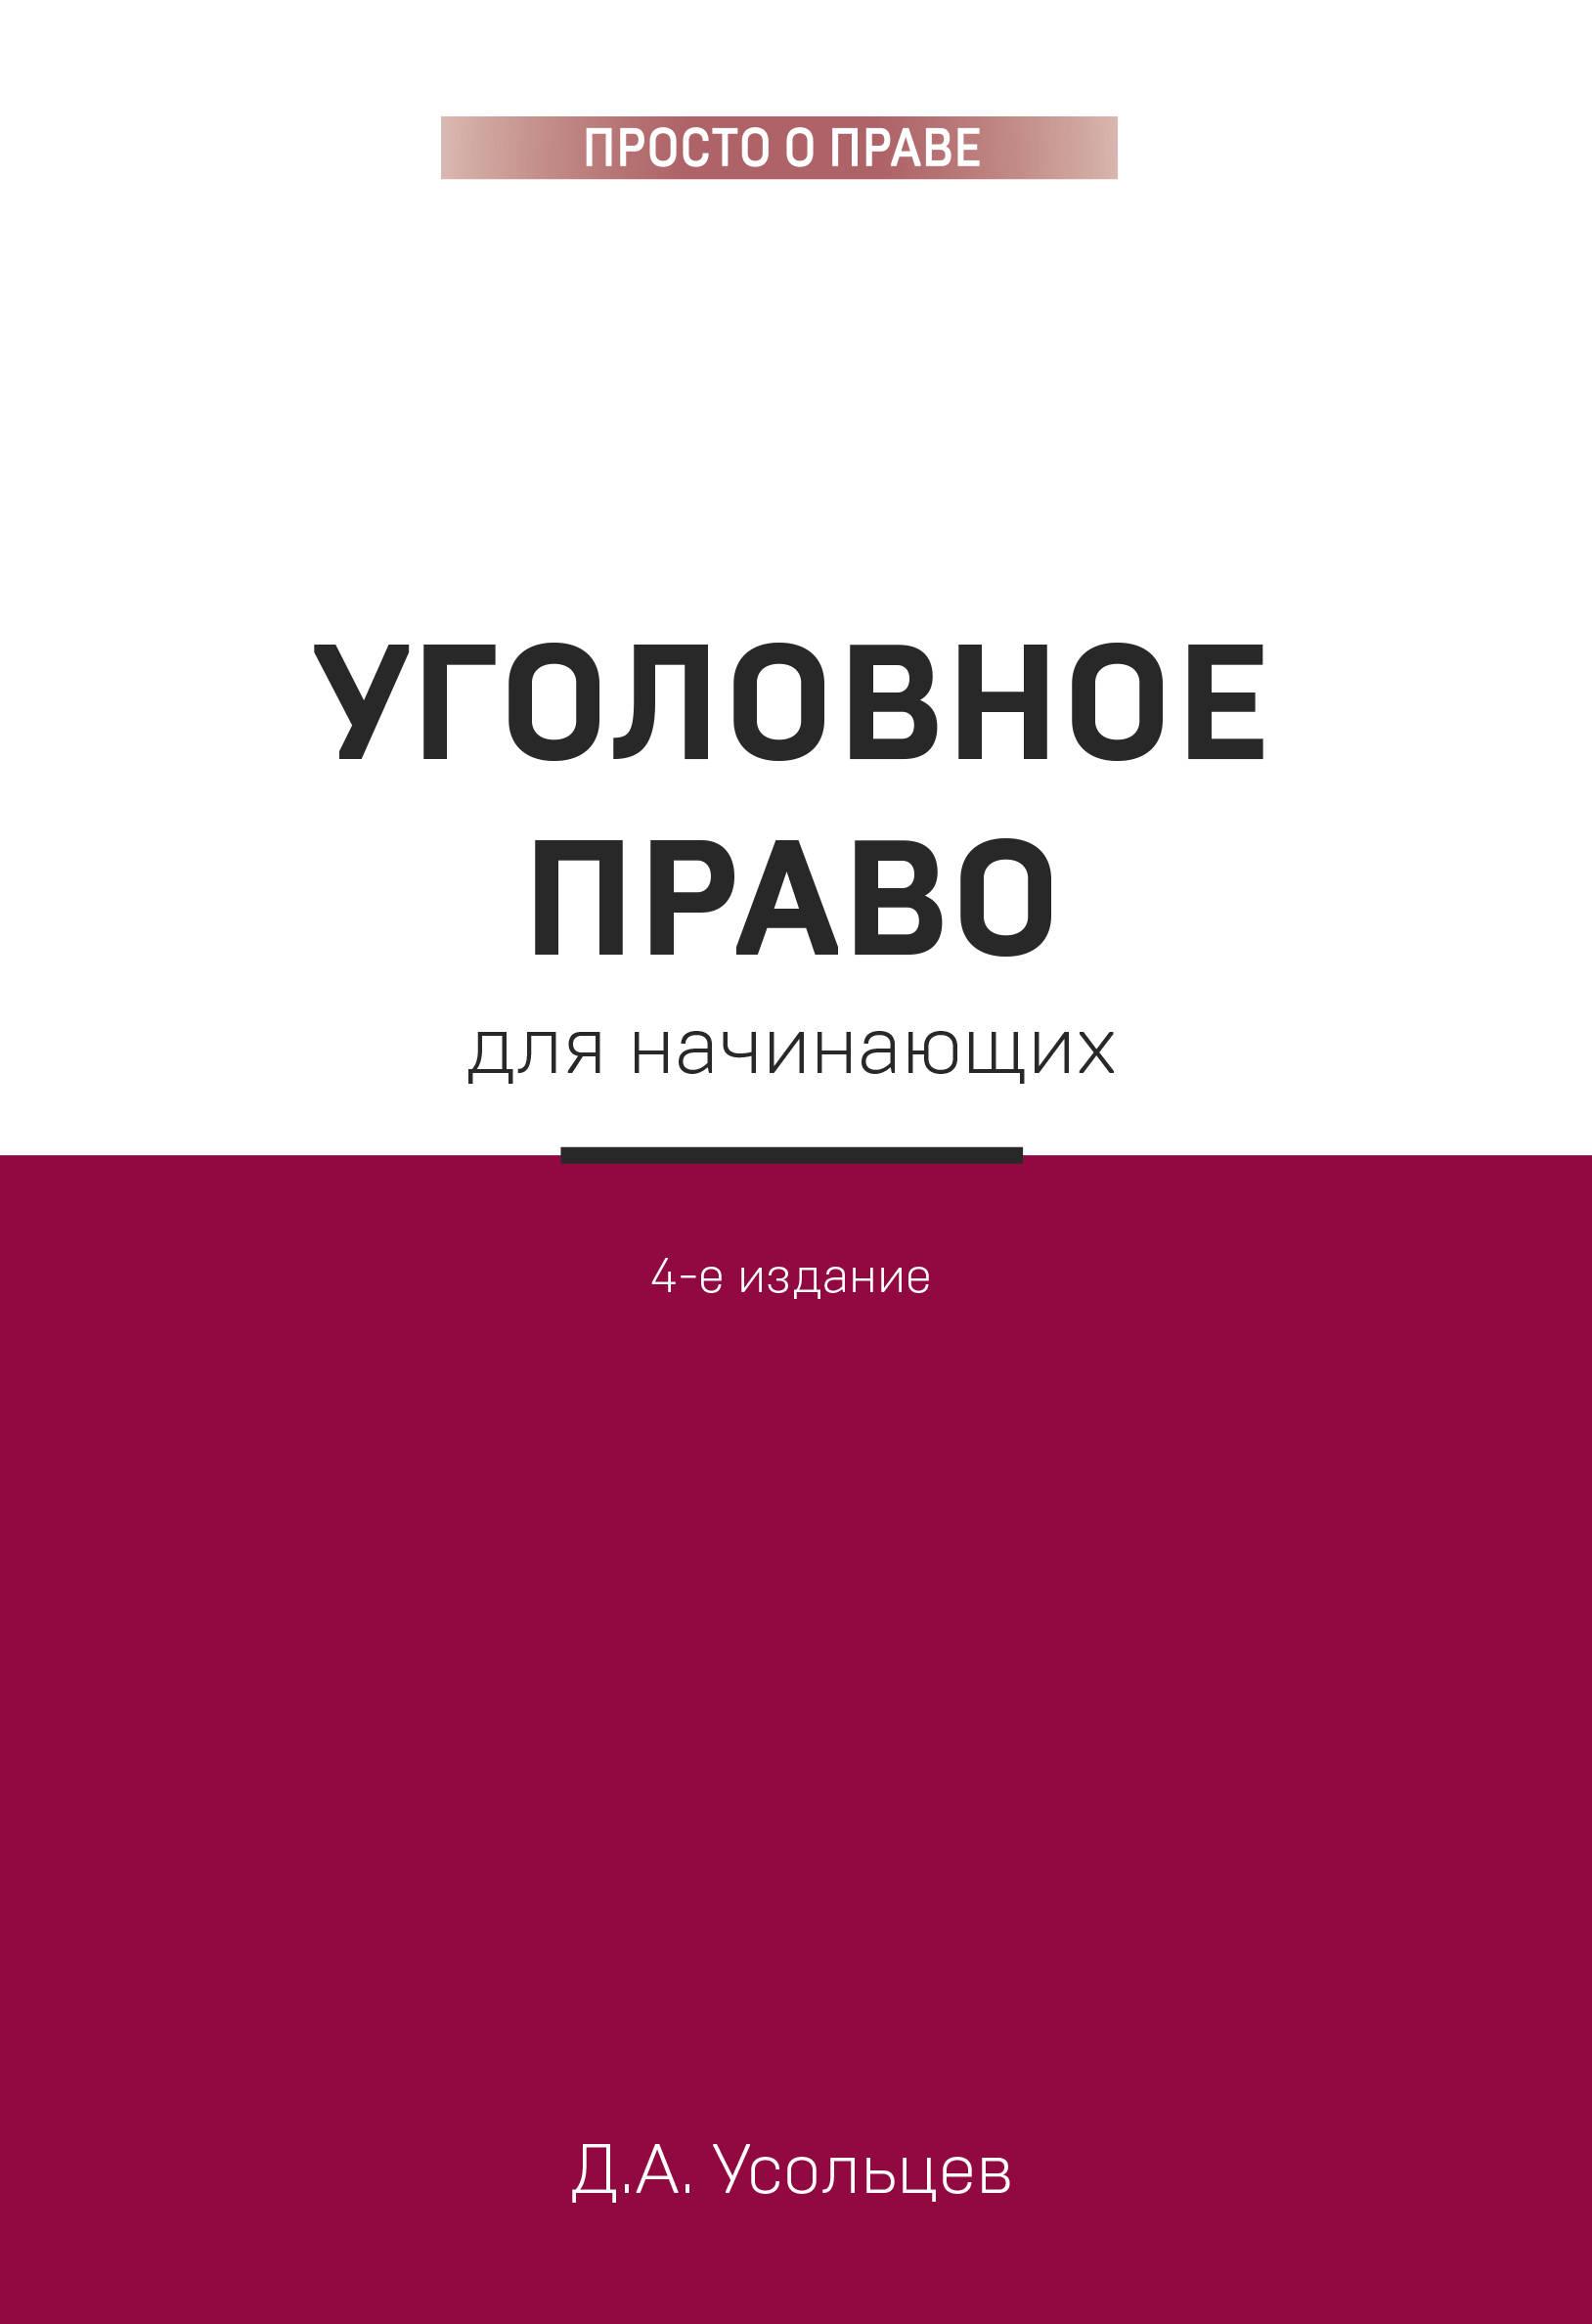 Ugolovnoe pravo dlja nachinajuschikh. 4-e izdanie